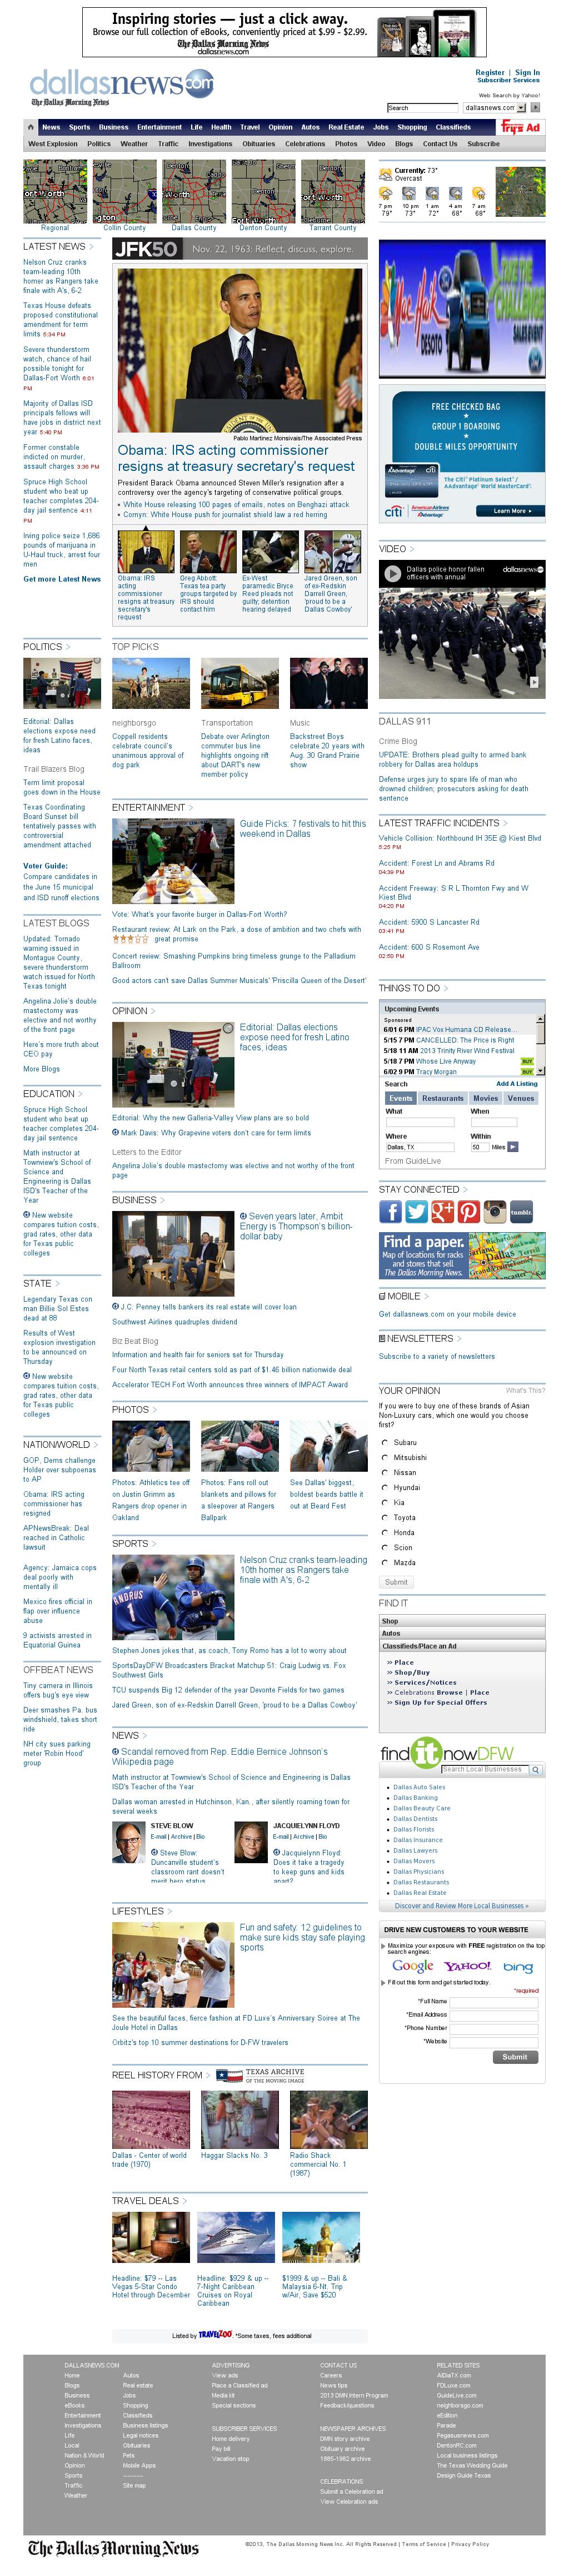 dallasnews.com at Wednesday May 15, 2013, 11:04 p.m. UTC